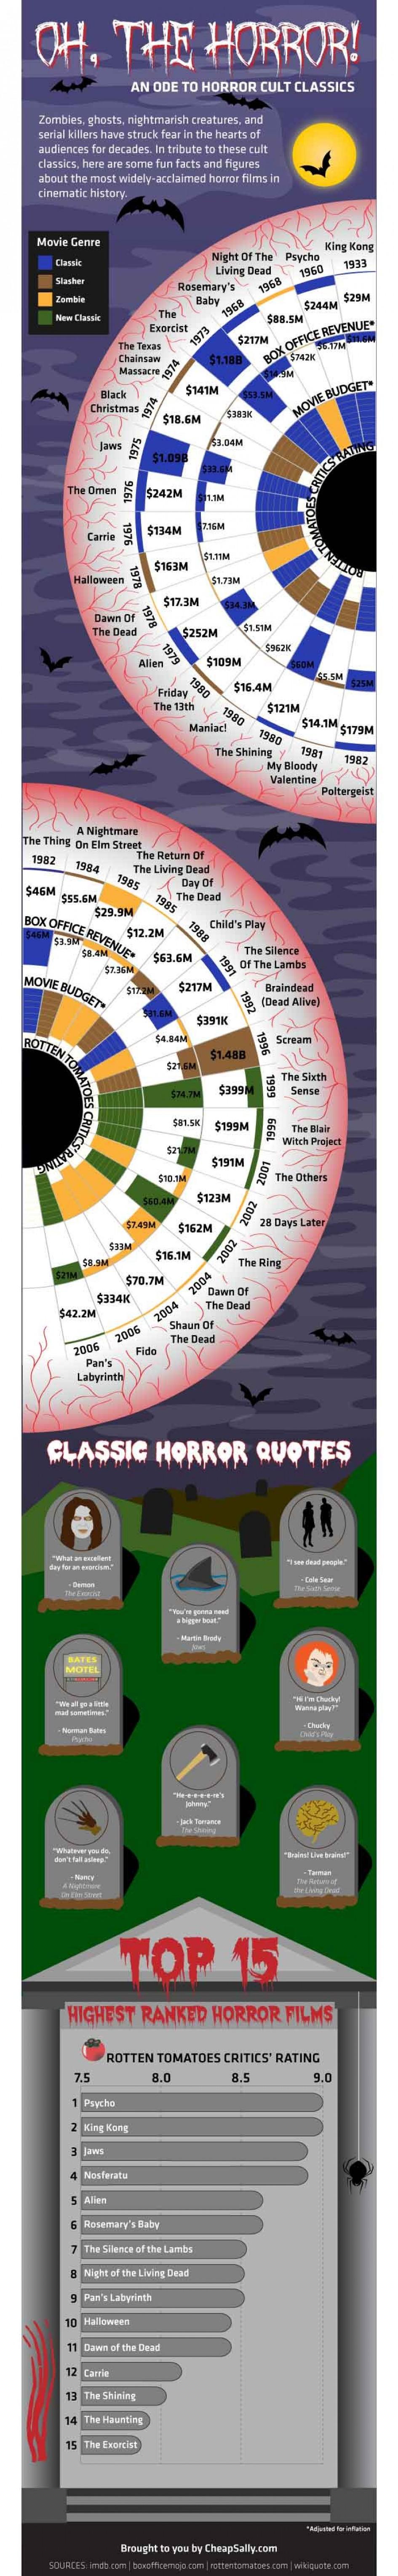 5. Classic horror movies